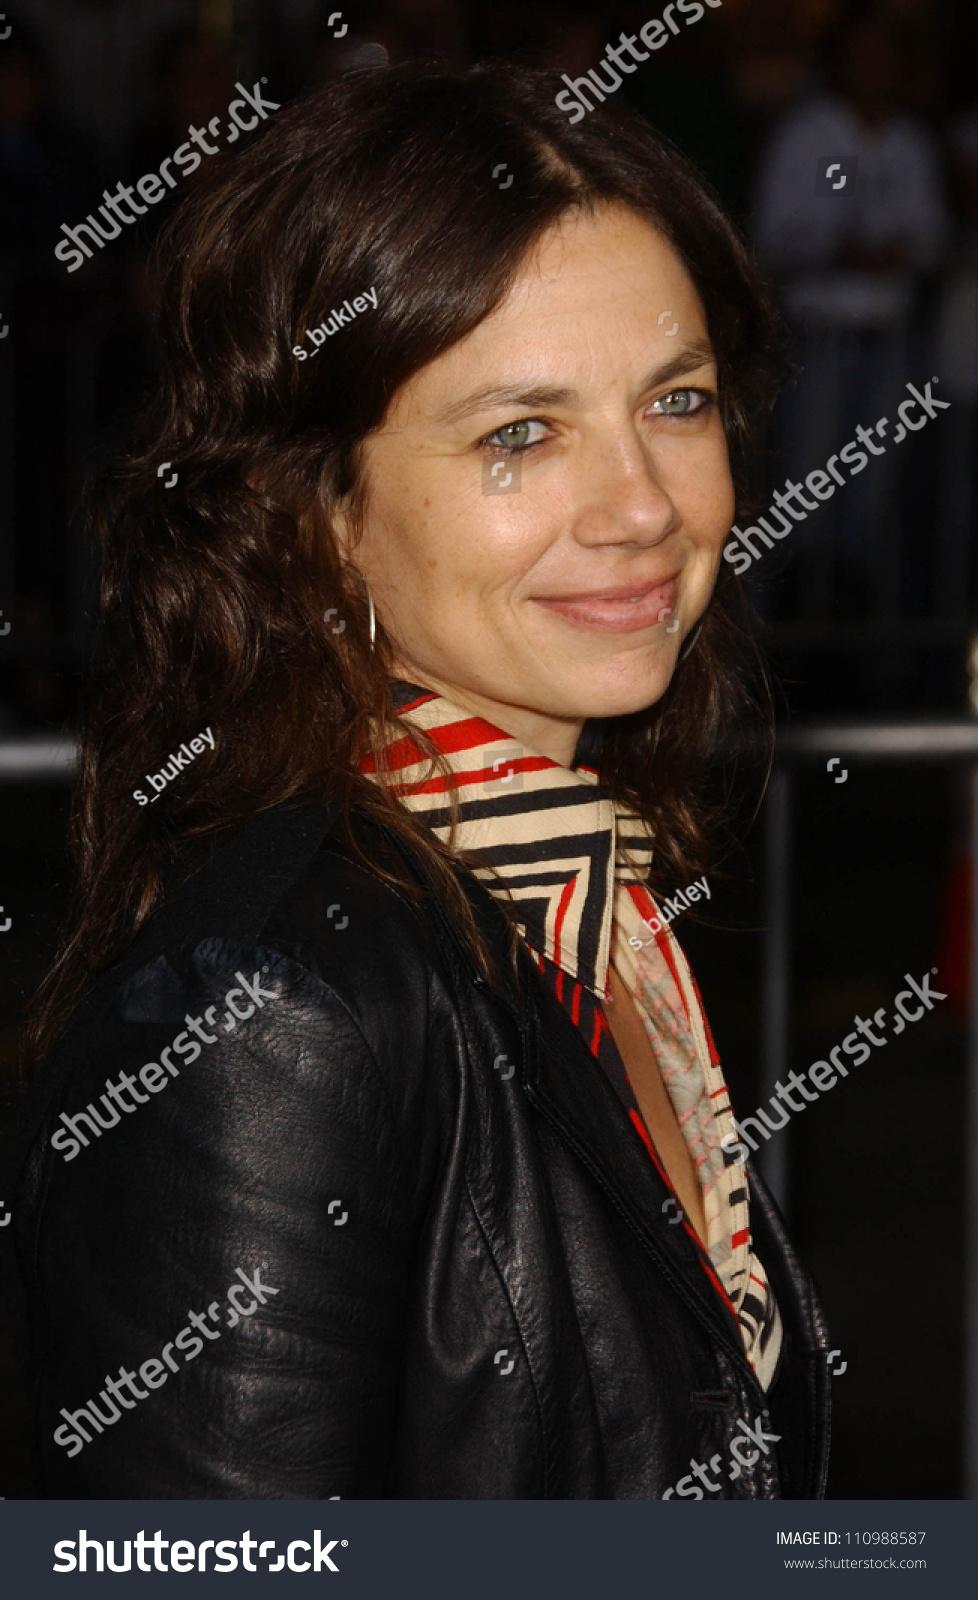 Audrey Ferris,Dorothy Revier Erotic photos Robyn Nevin,Pamela Hensley born October 3, 1950 (age 68)